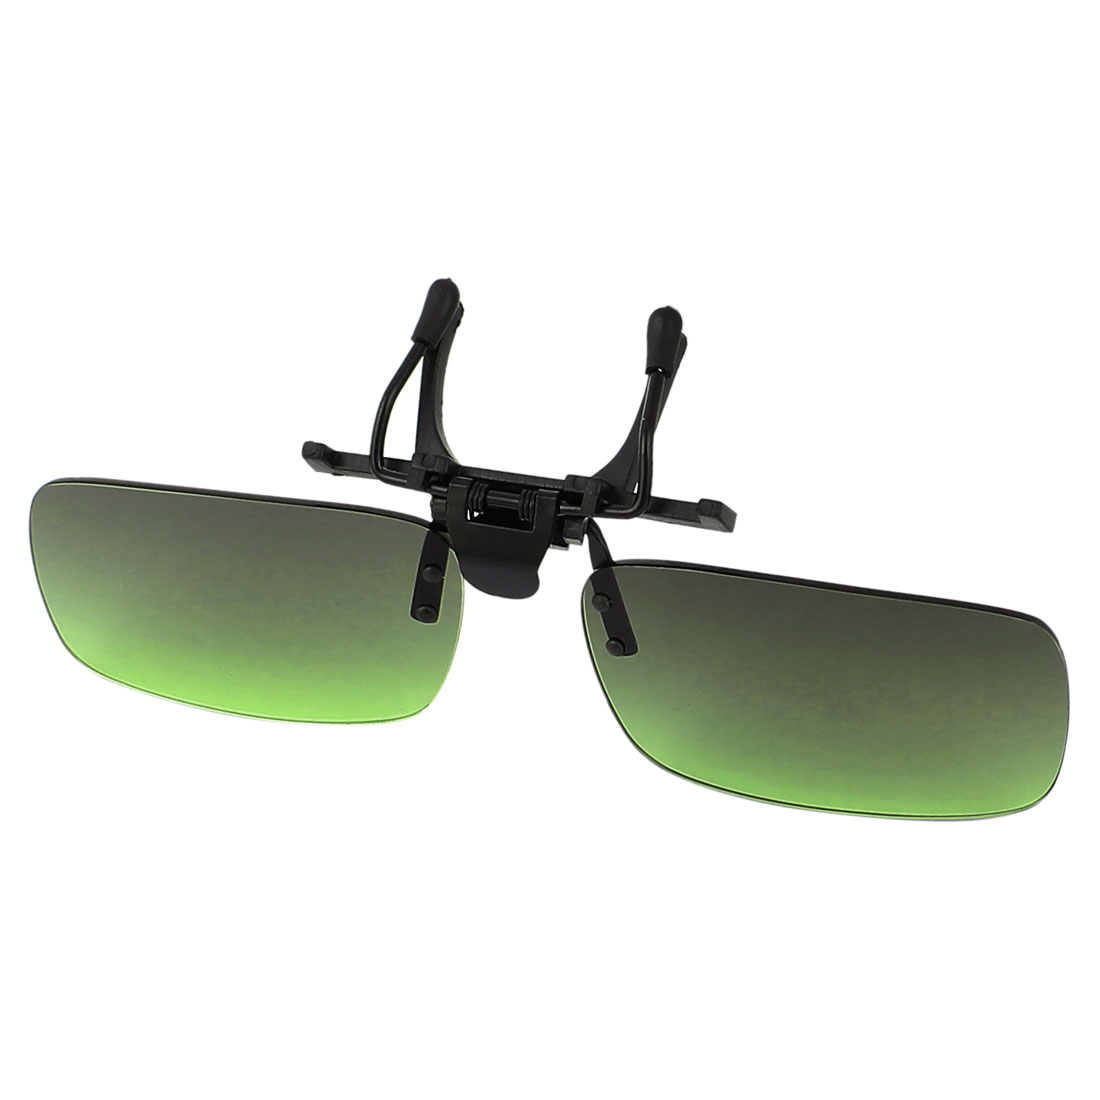 Green Lens Rimless Anti Glare Clip On Driving Sunglasses Eyeglasses 128 x 33mm